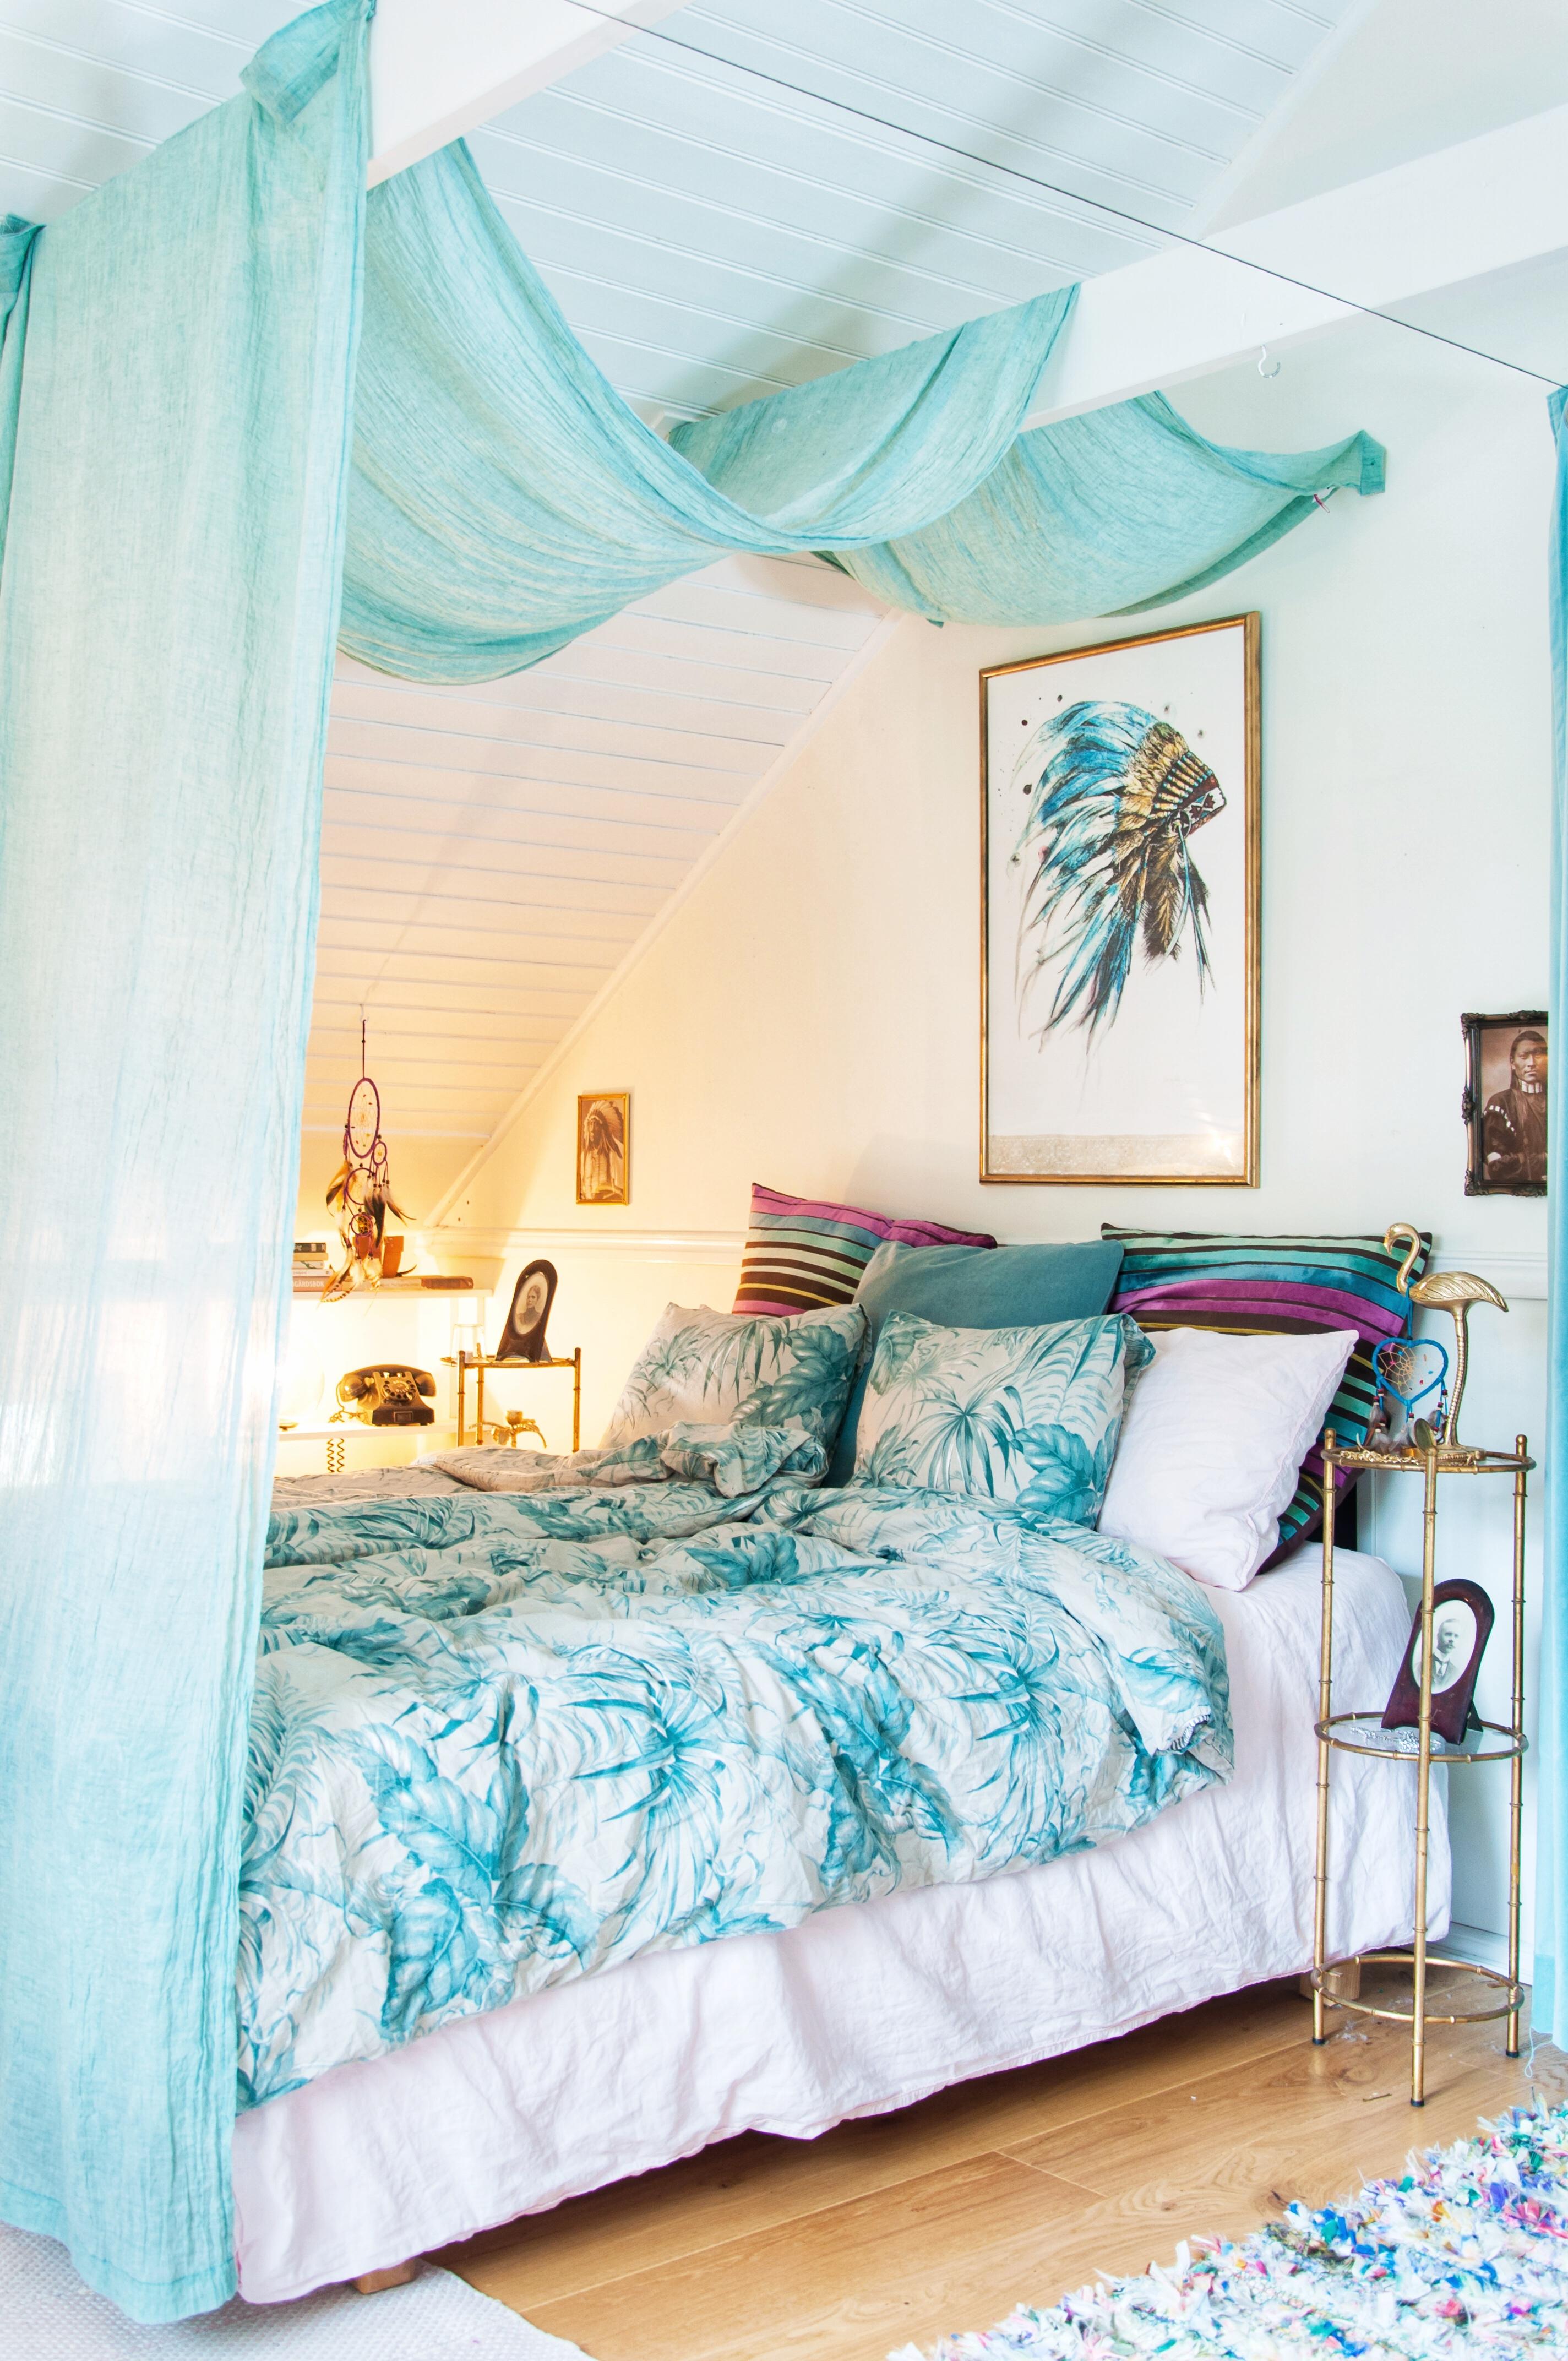 Inred ditt sovrum - 7 tips på hur du får ett mysigt sovrum , Leonor Juhl K